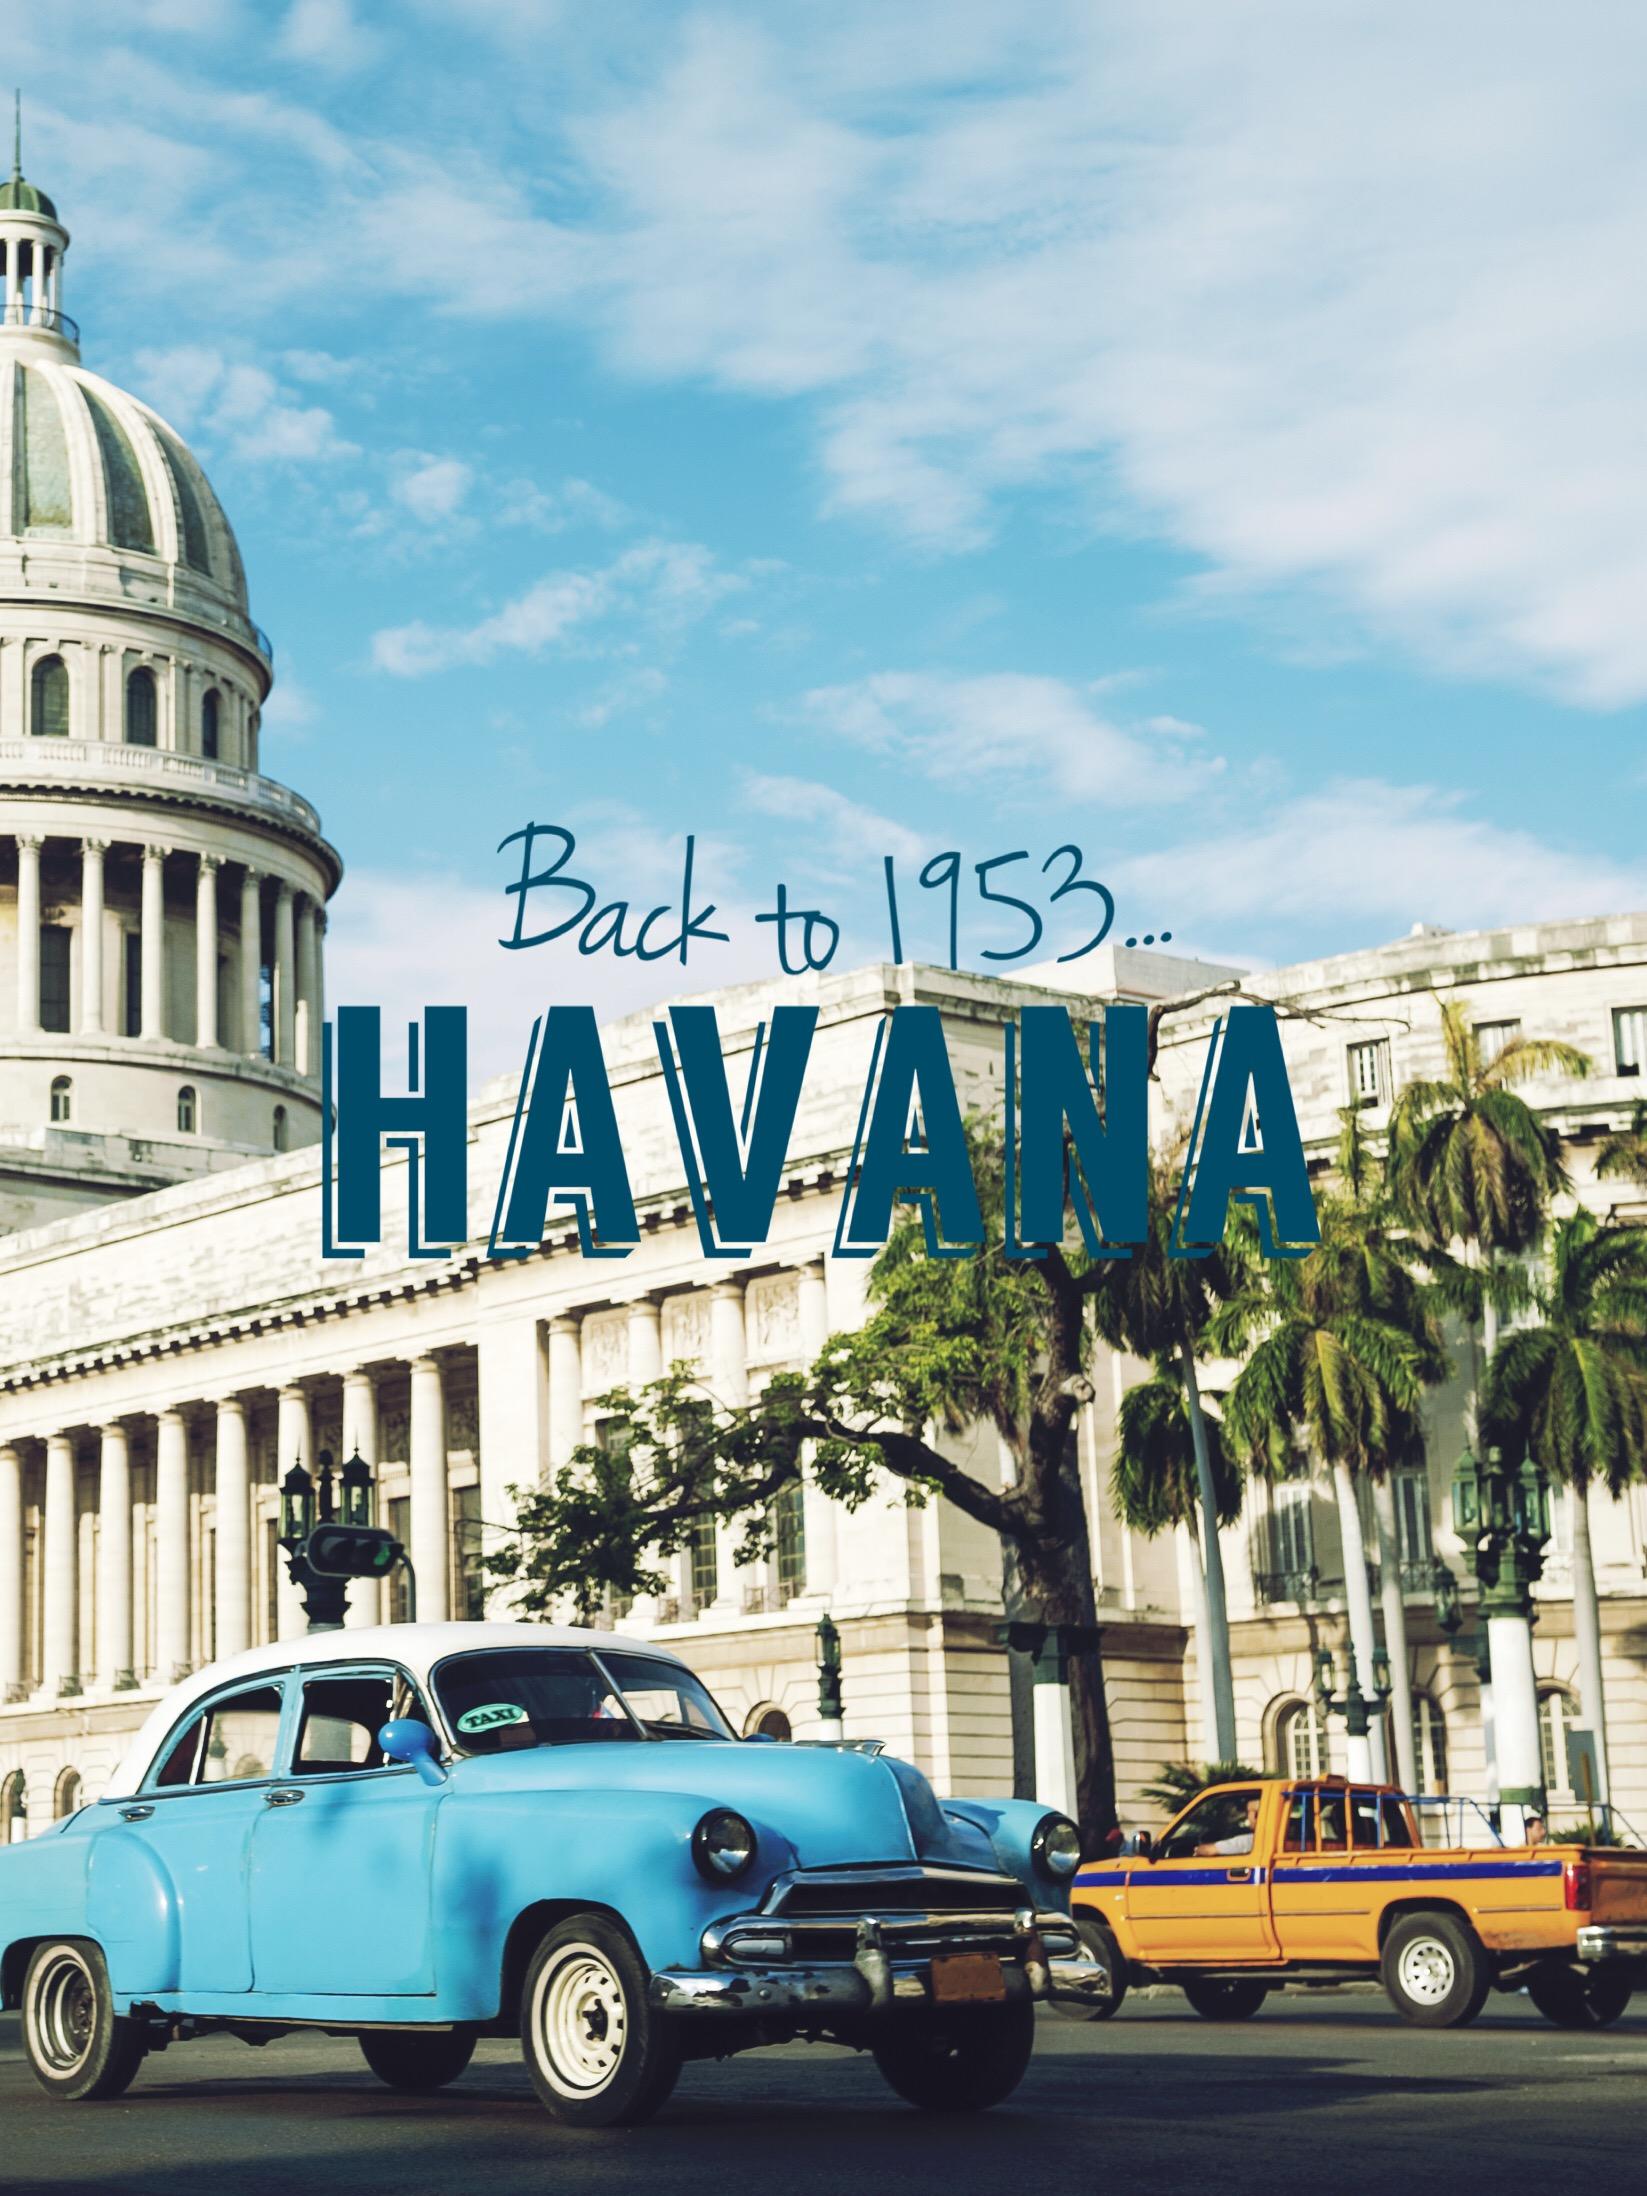 Back to 1953 – Havana's First Impression